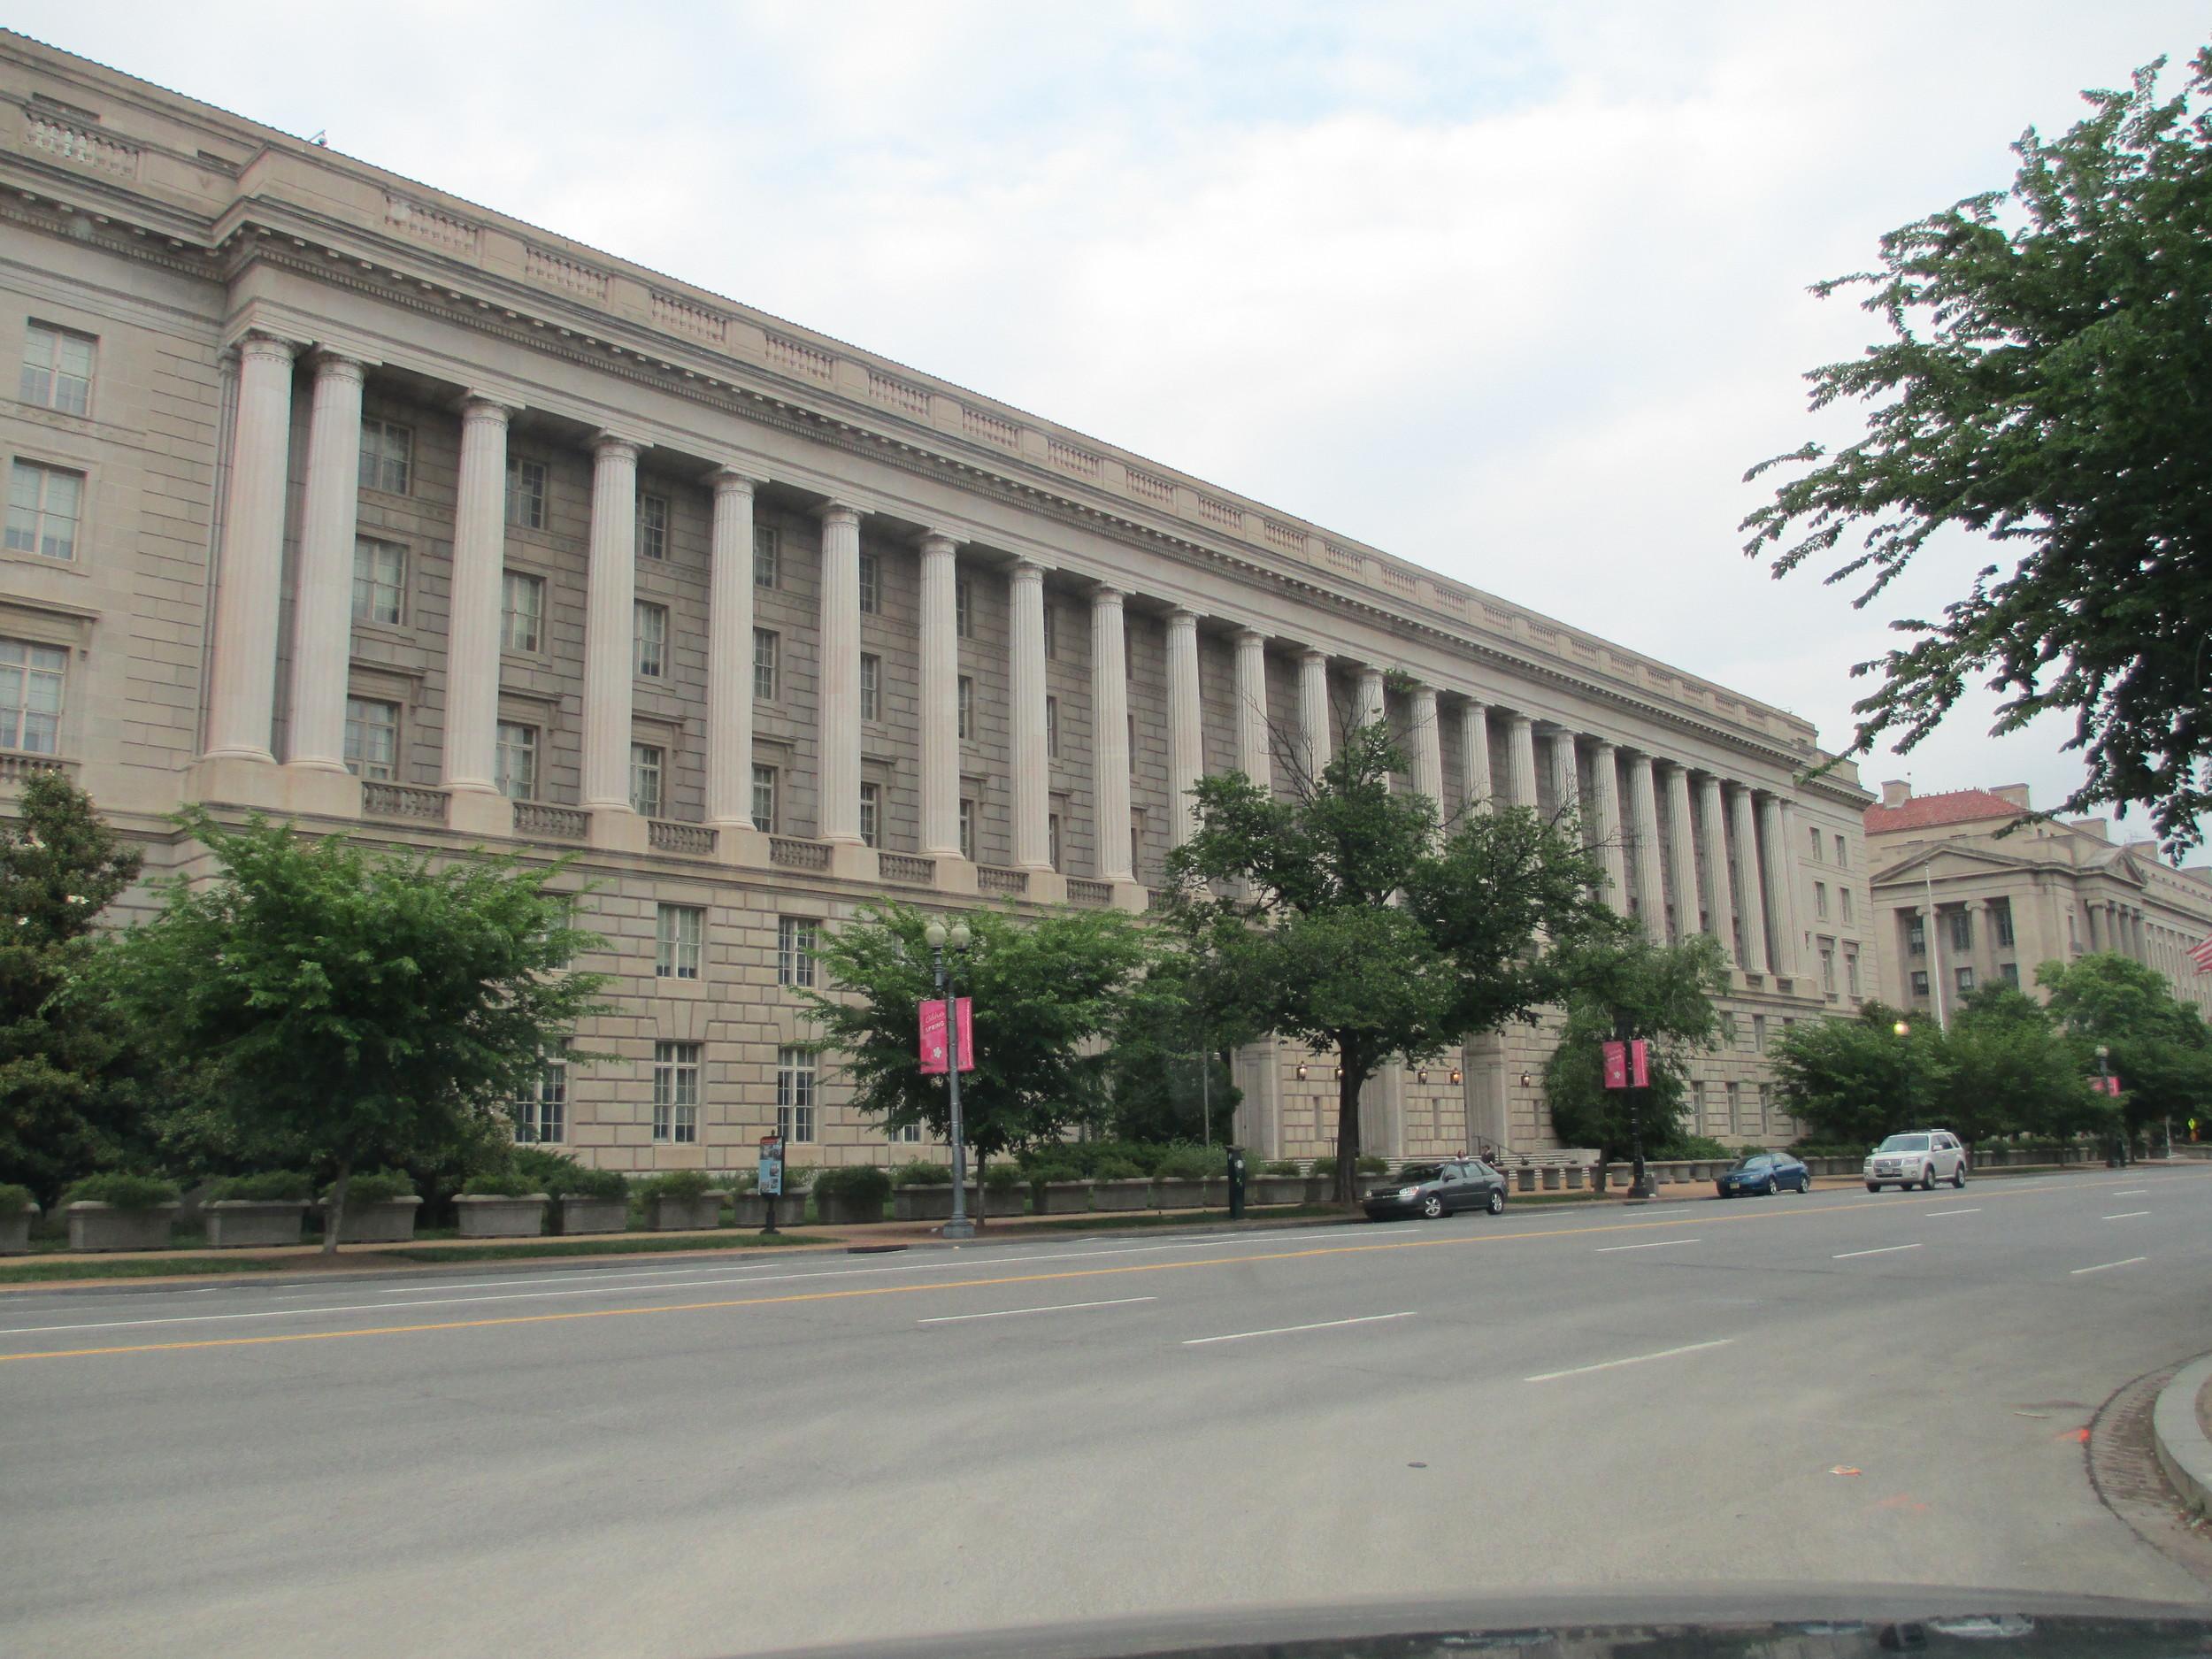 The IRS building in Washington, DC. Credit: Joshua Doubek via Wikimedia Commons.